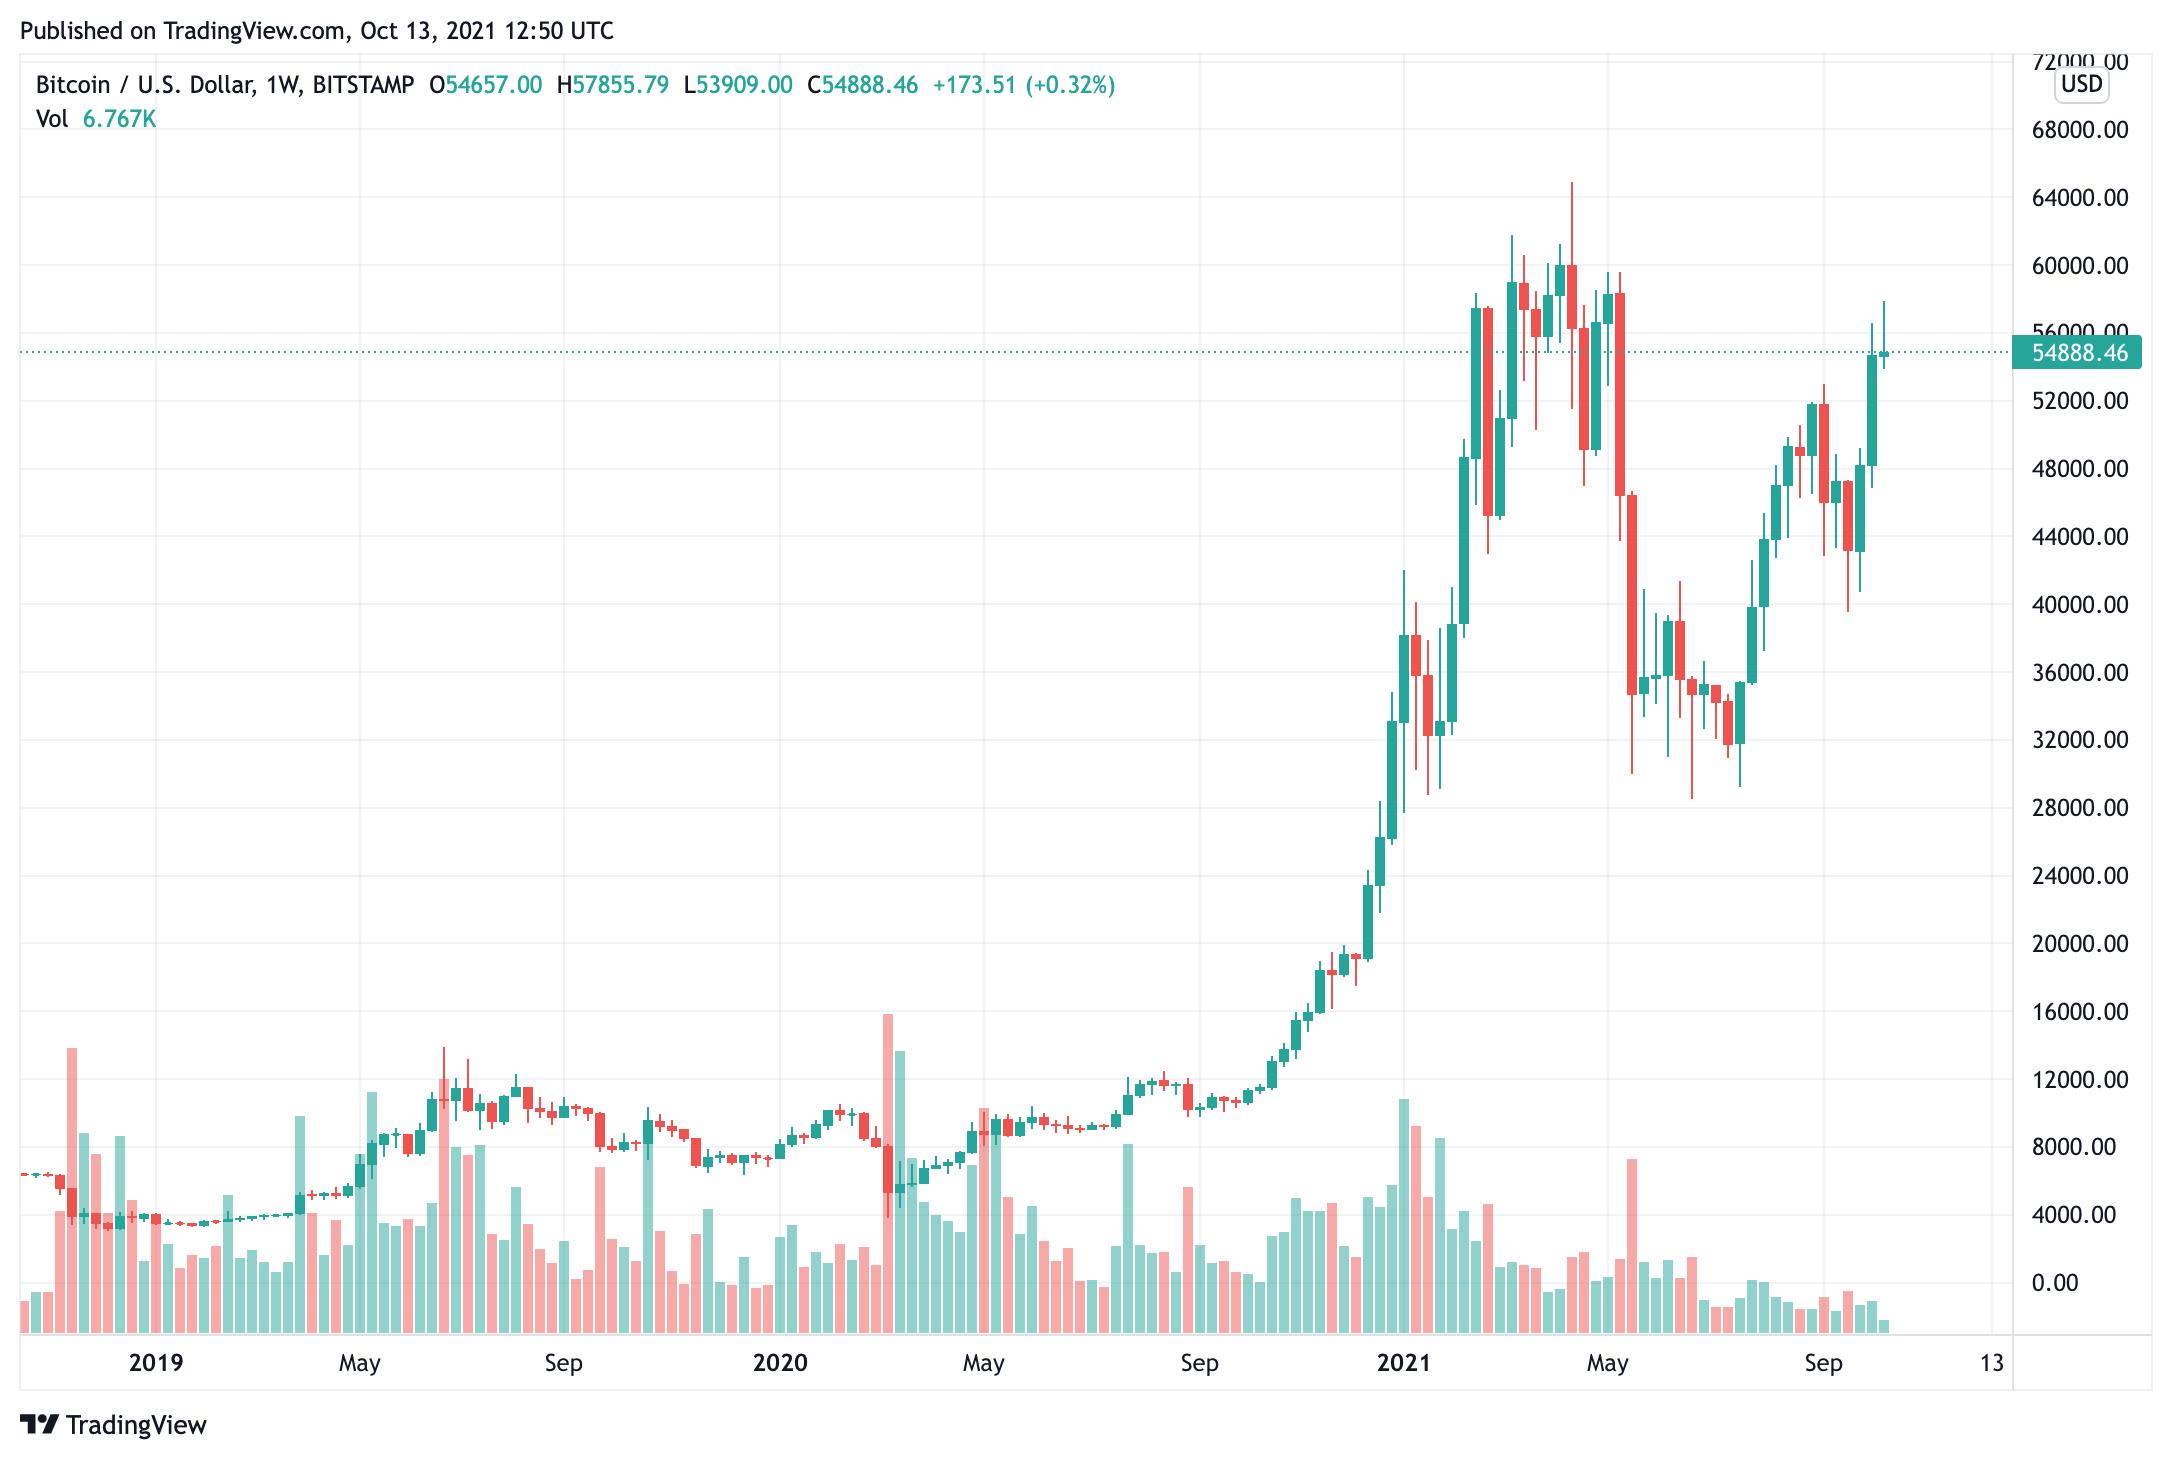 larry-fink-blackrock-ceo-joins-jamie-dimons-idea-that-bitcoin-is-vô-giá-trị